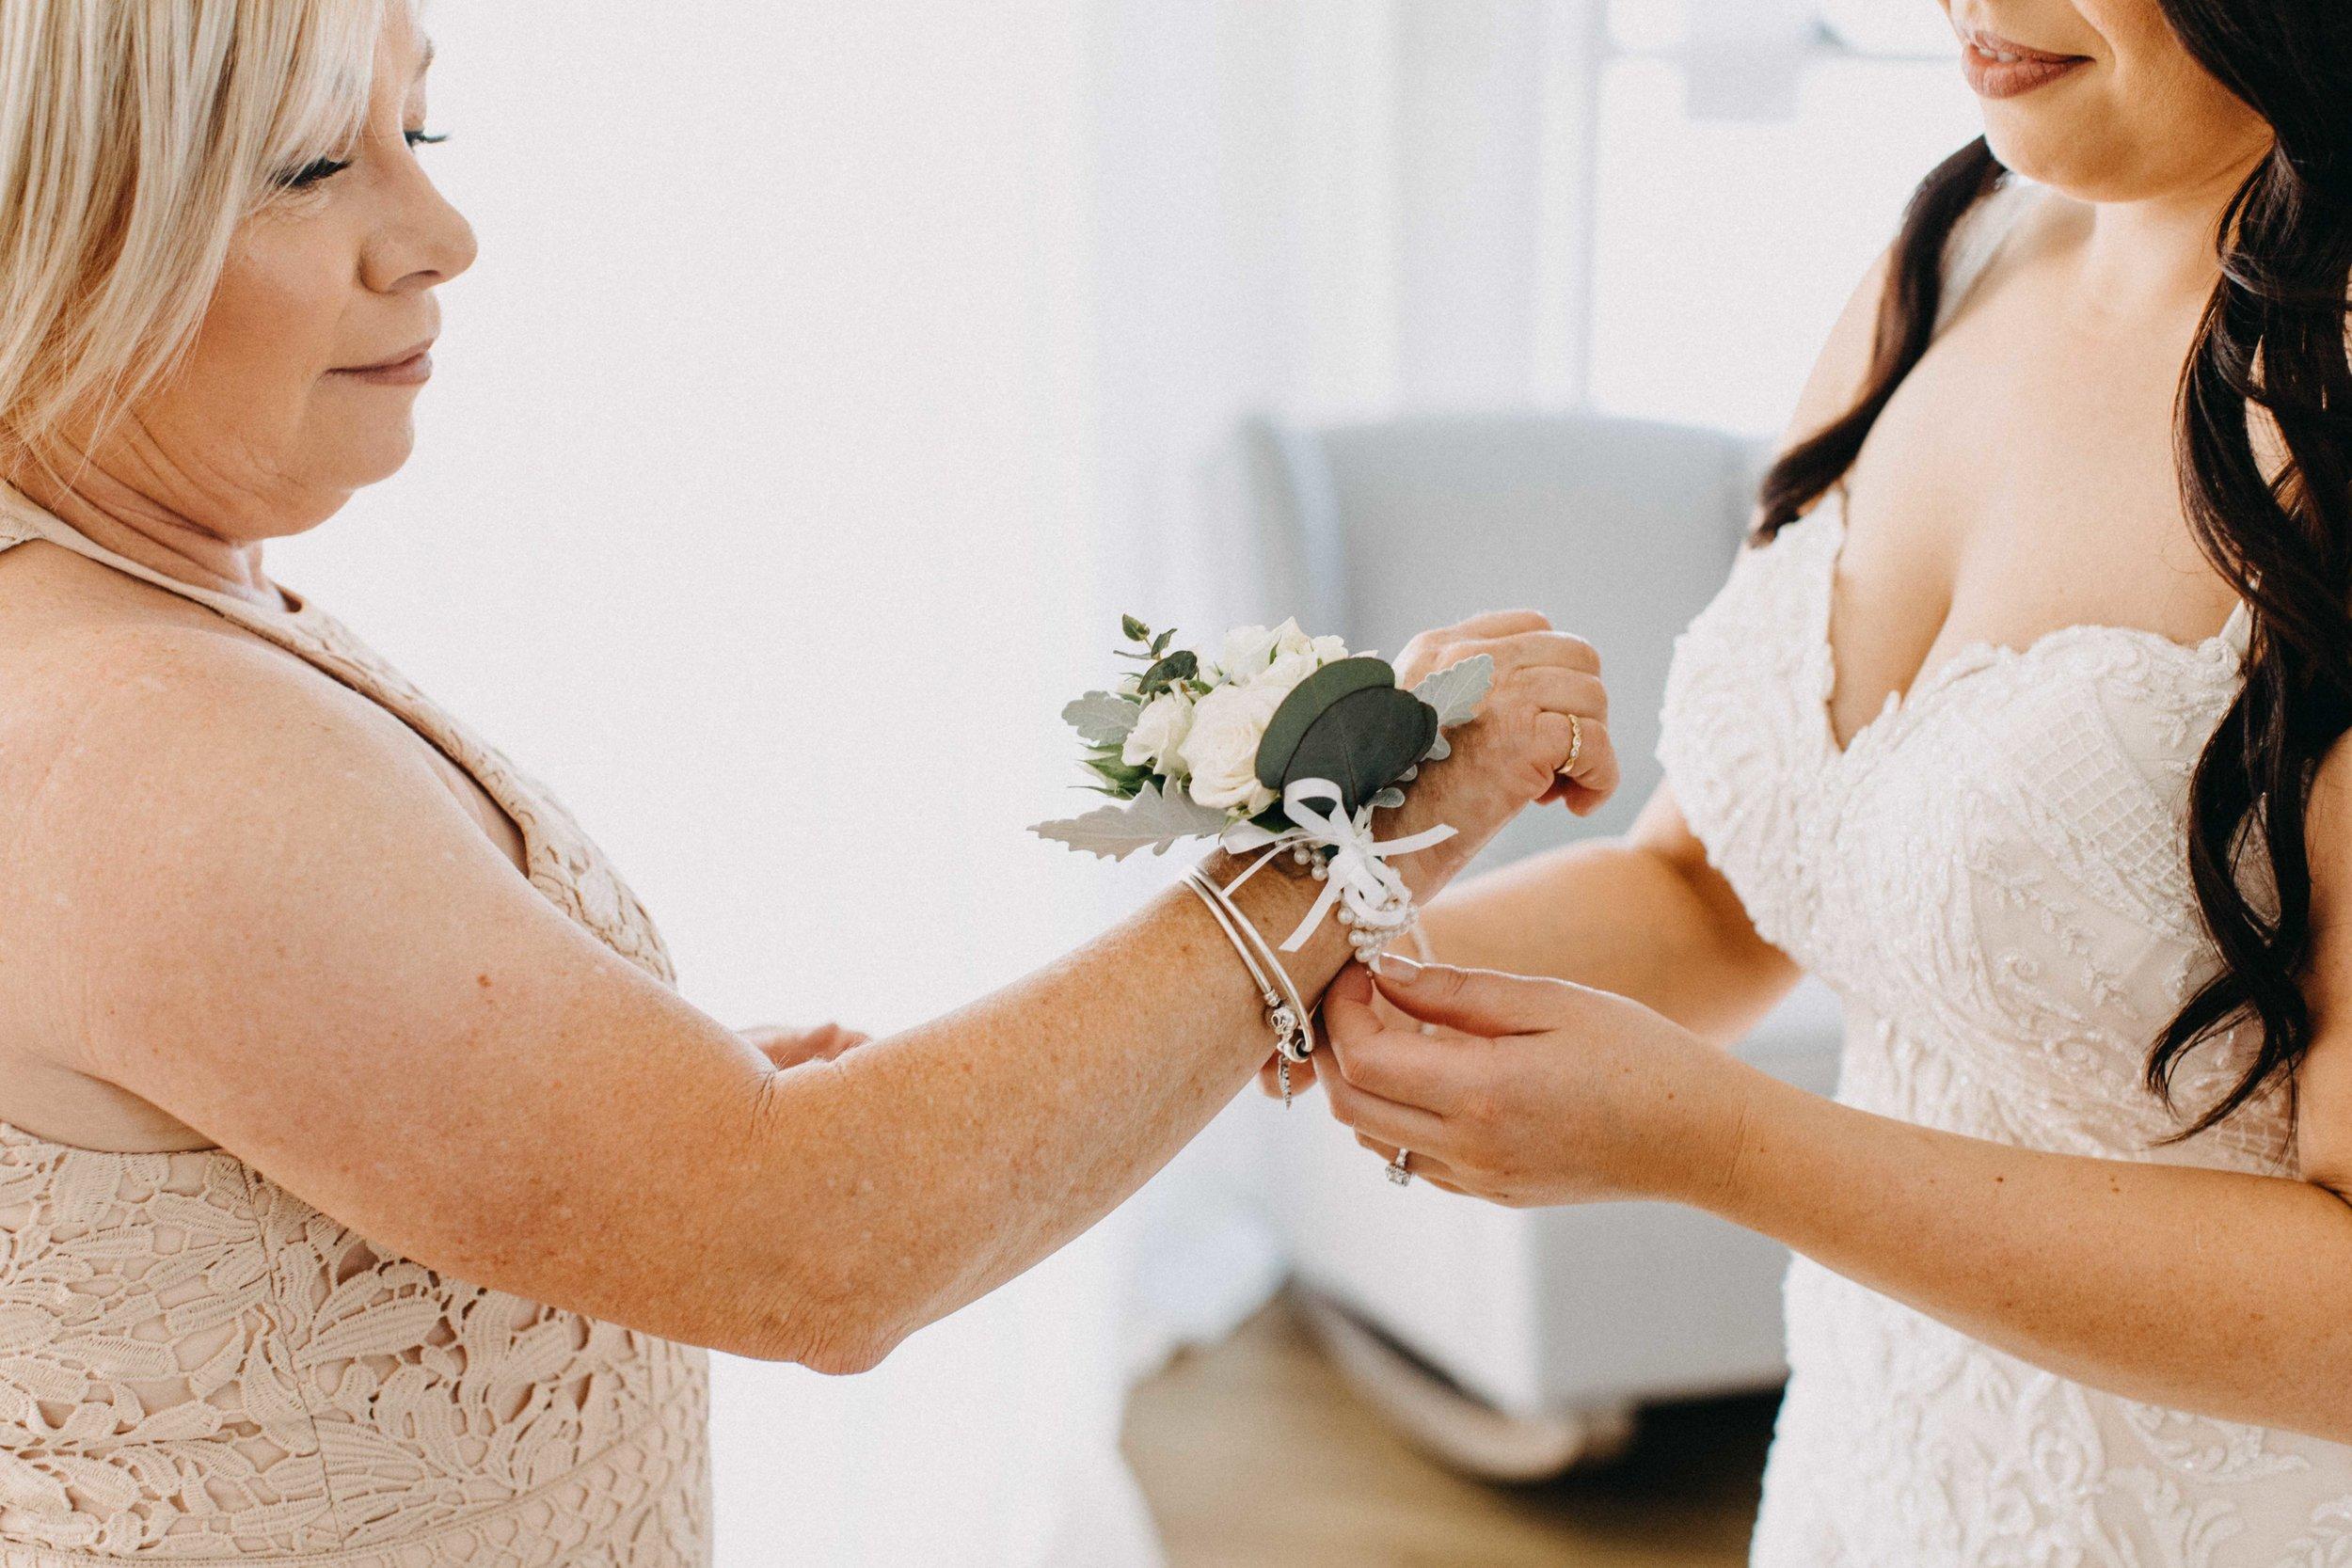 exeter-southern-highlands-wedding-www.emilyobrienphotography.net -44.jpg